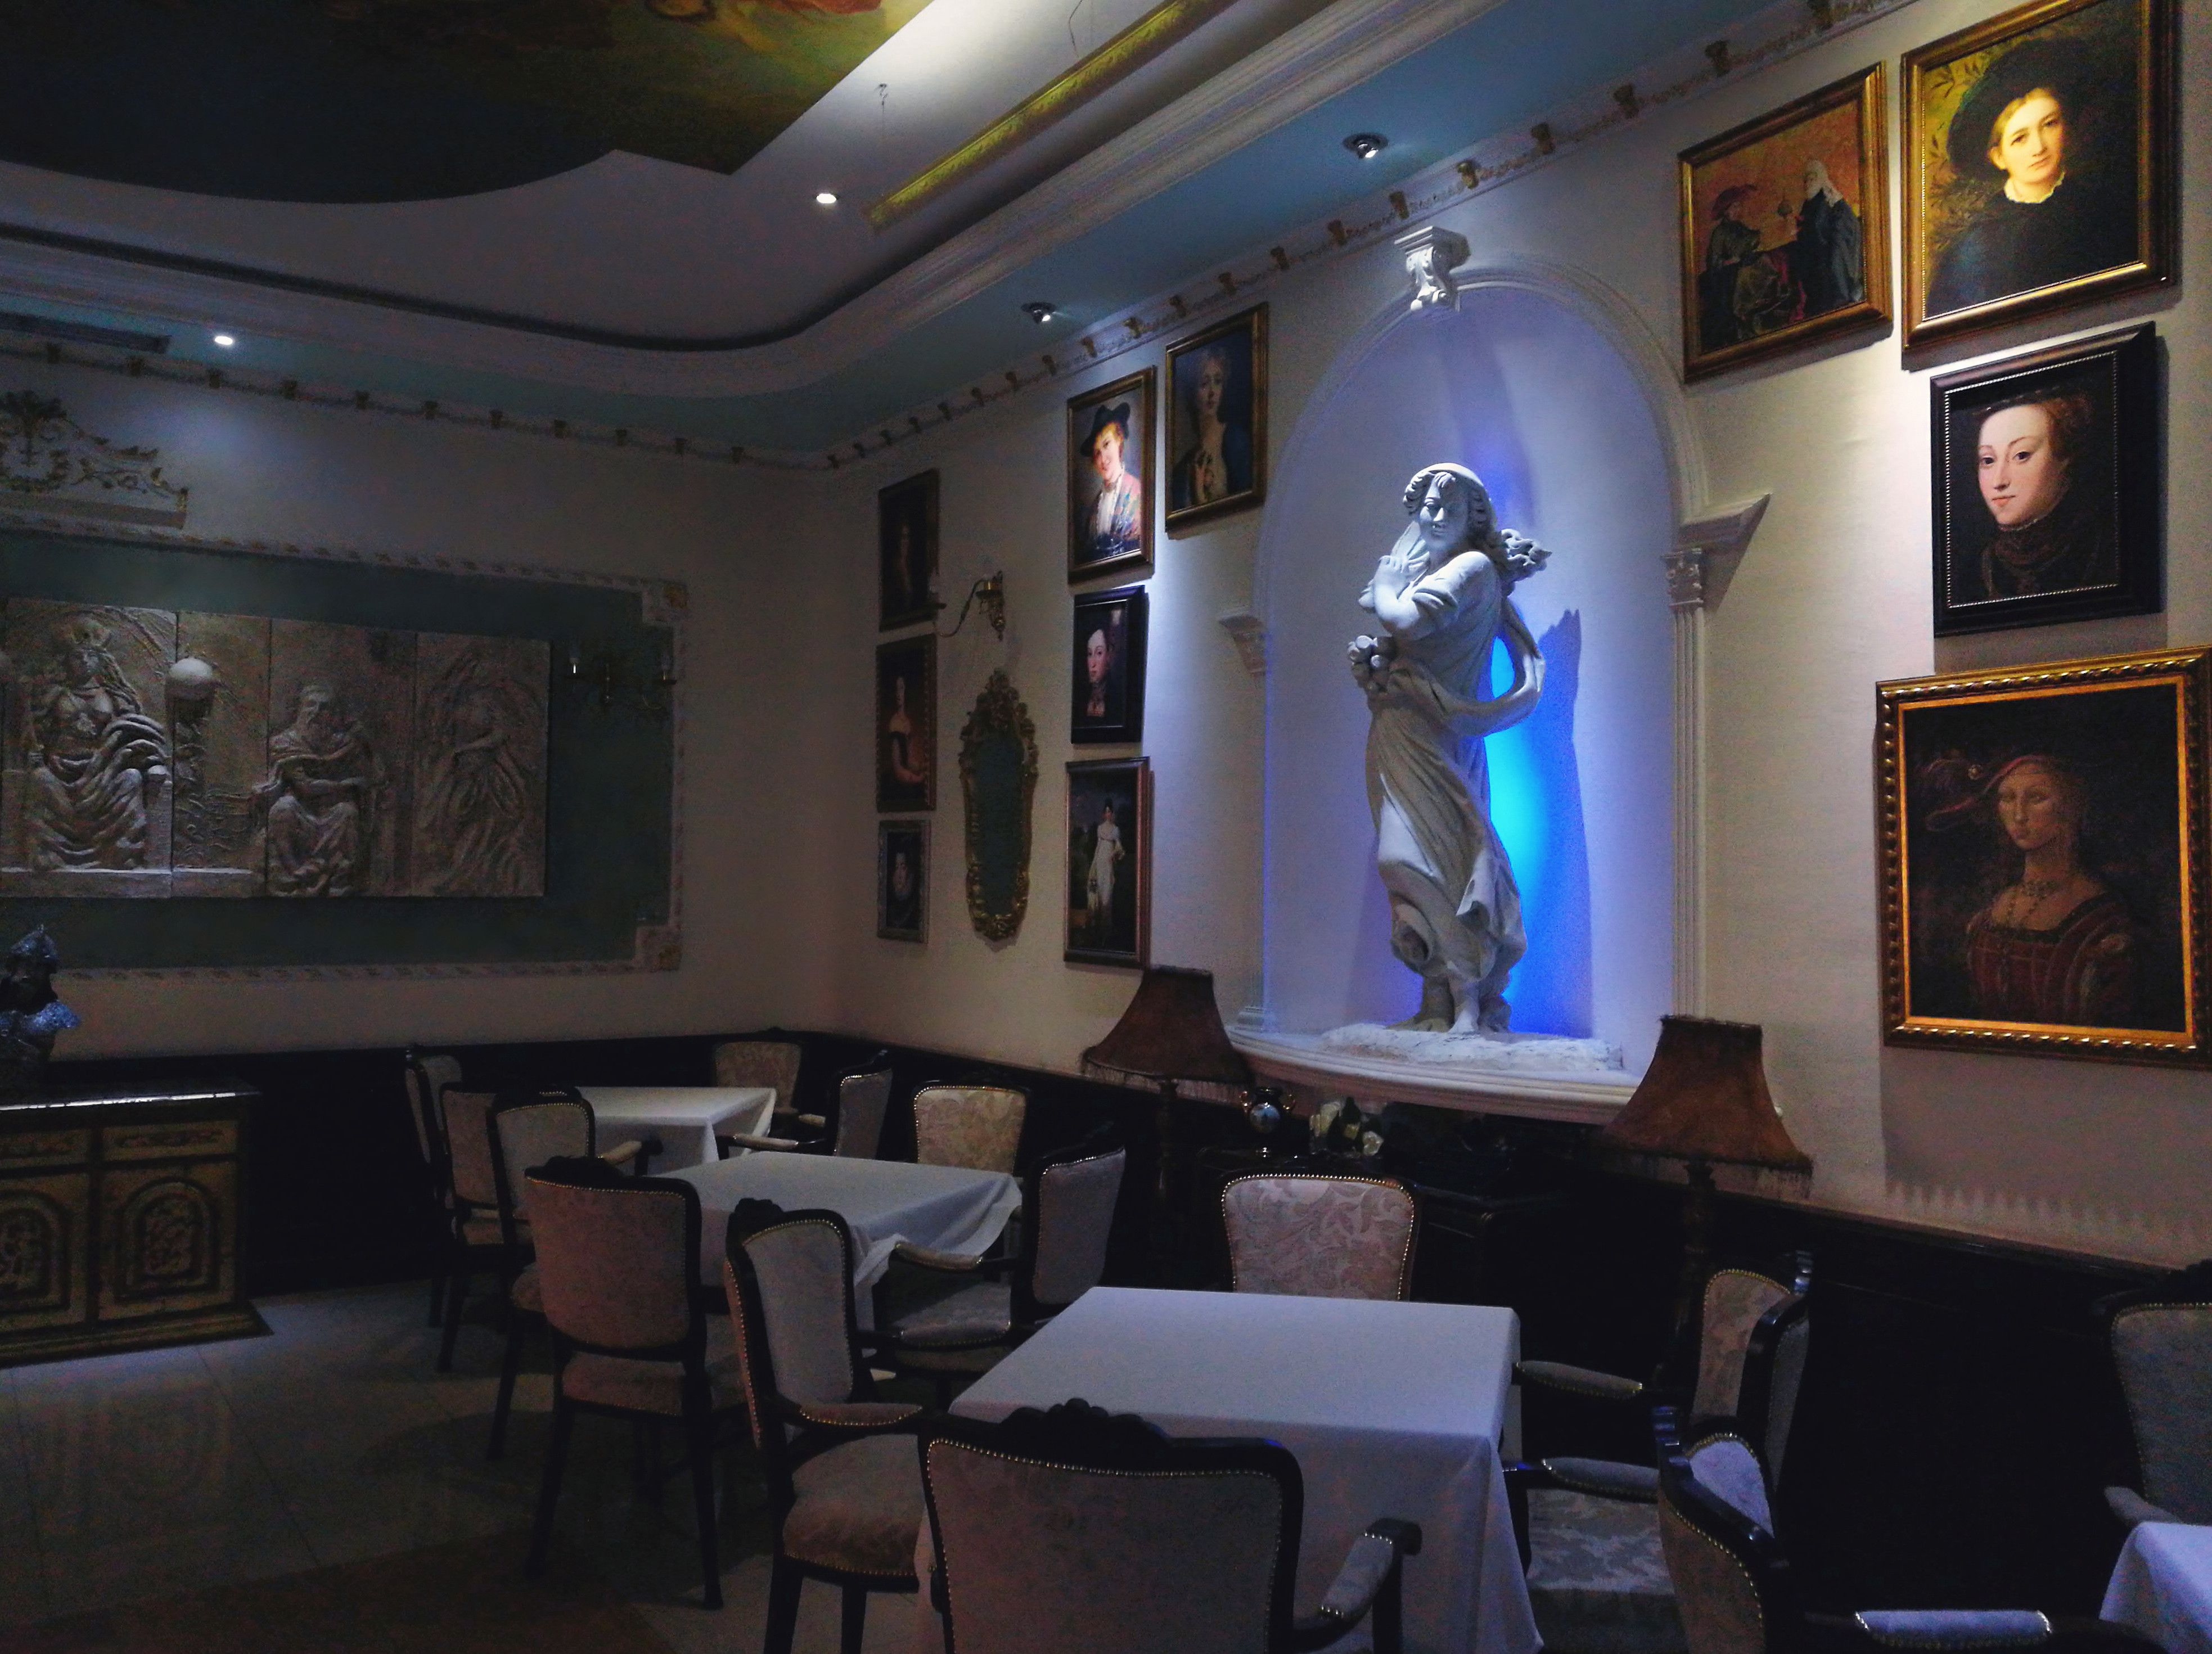 Queen S Astoria Design Hotel In Belgrade Serbia Hotels Design